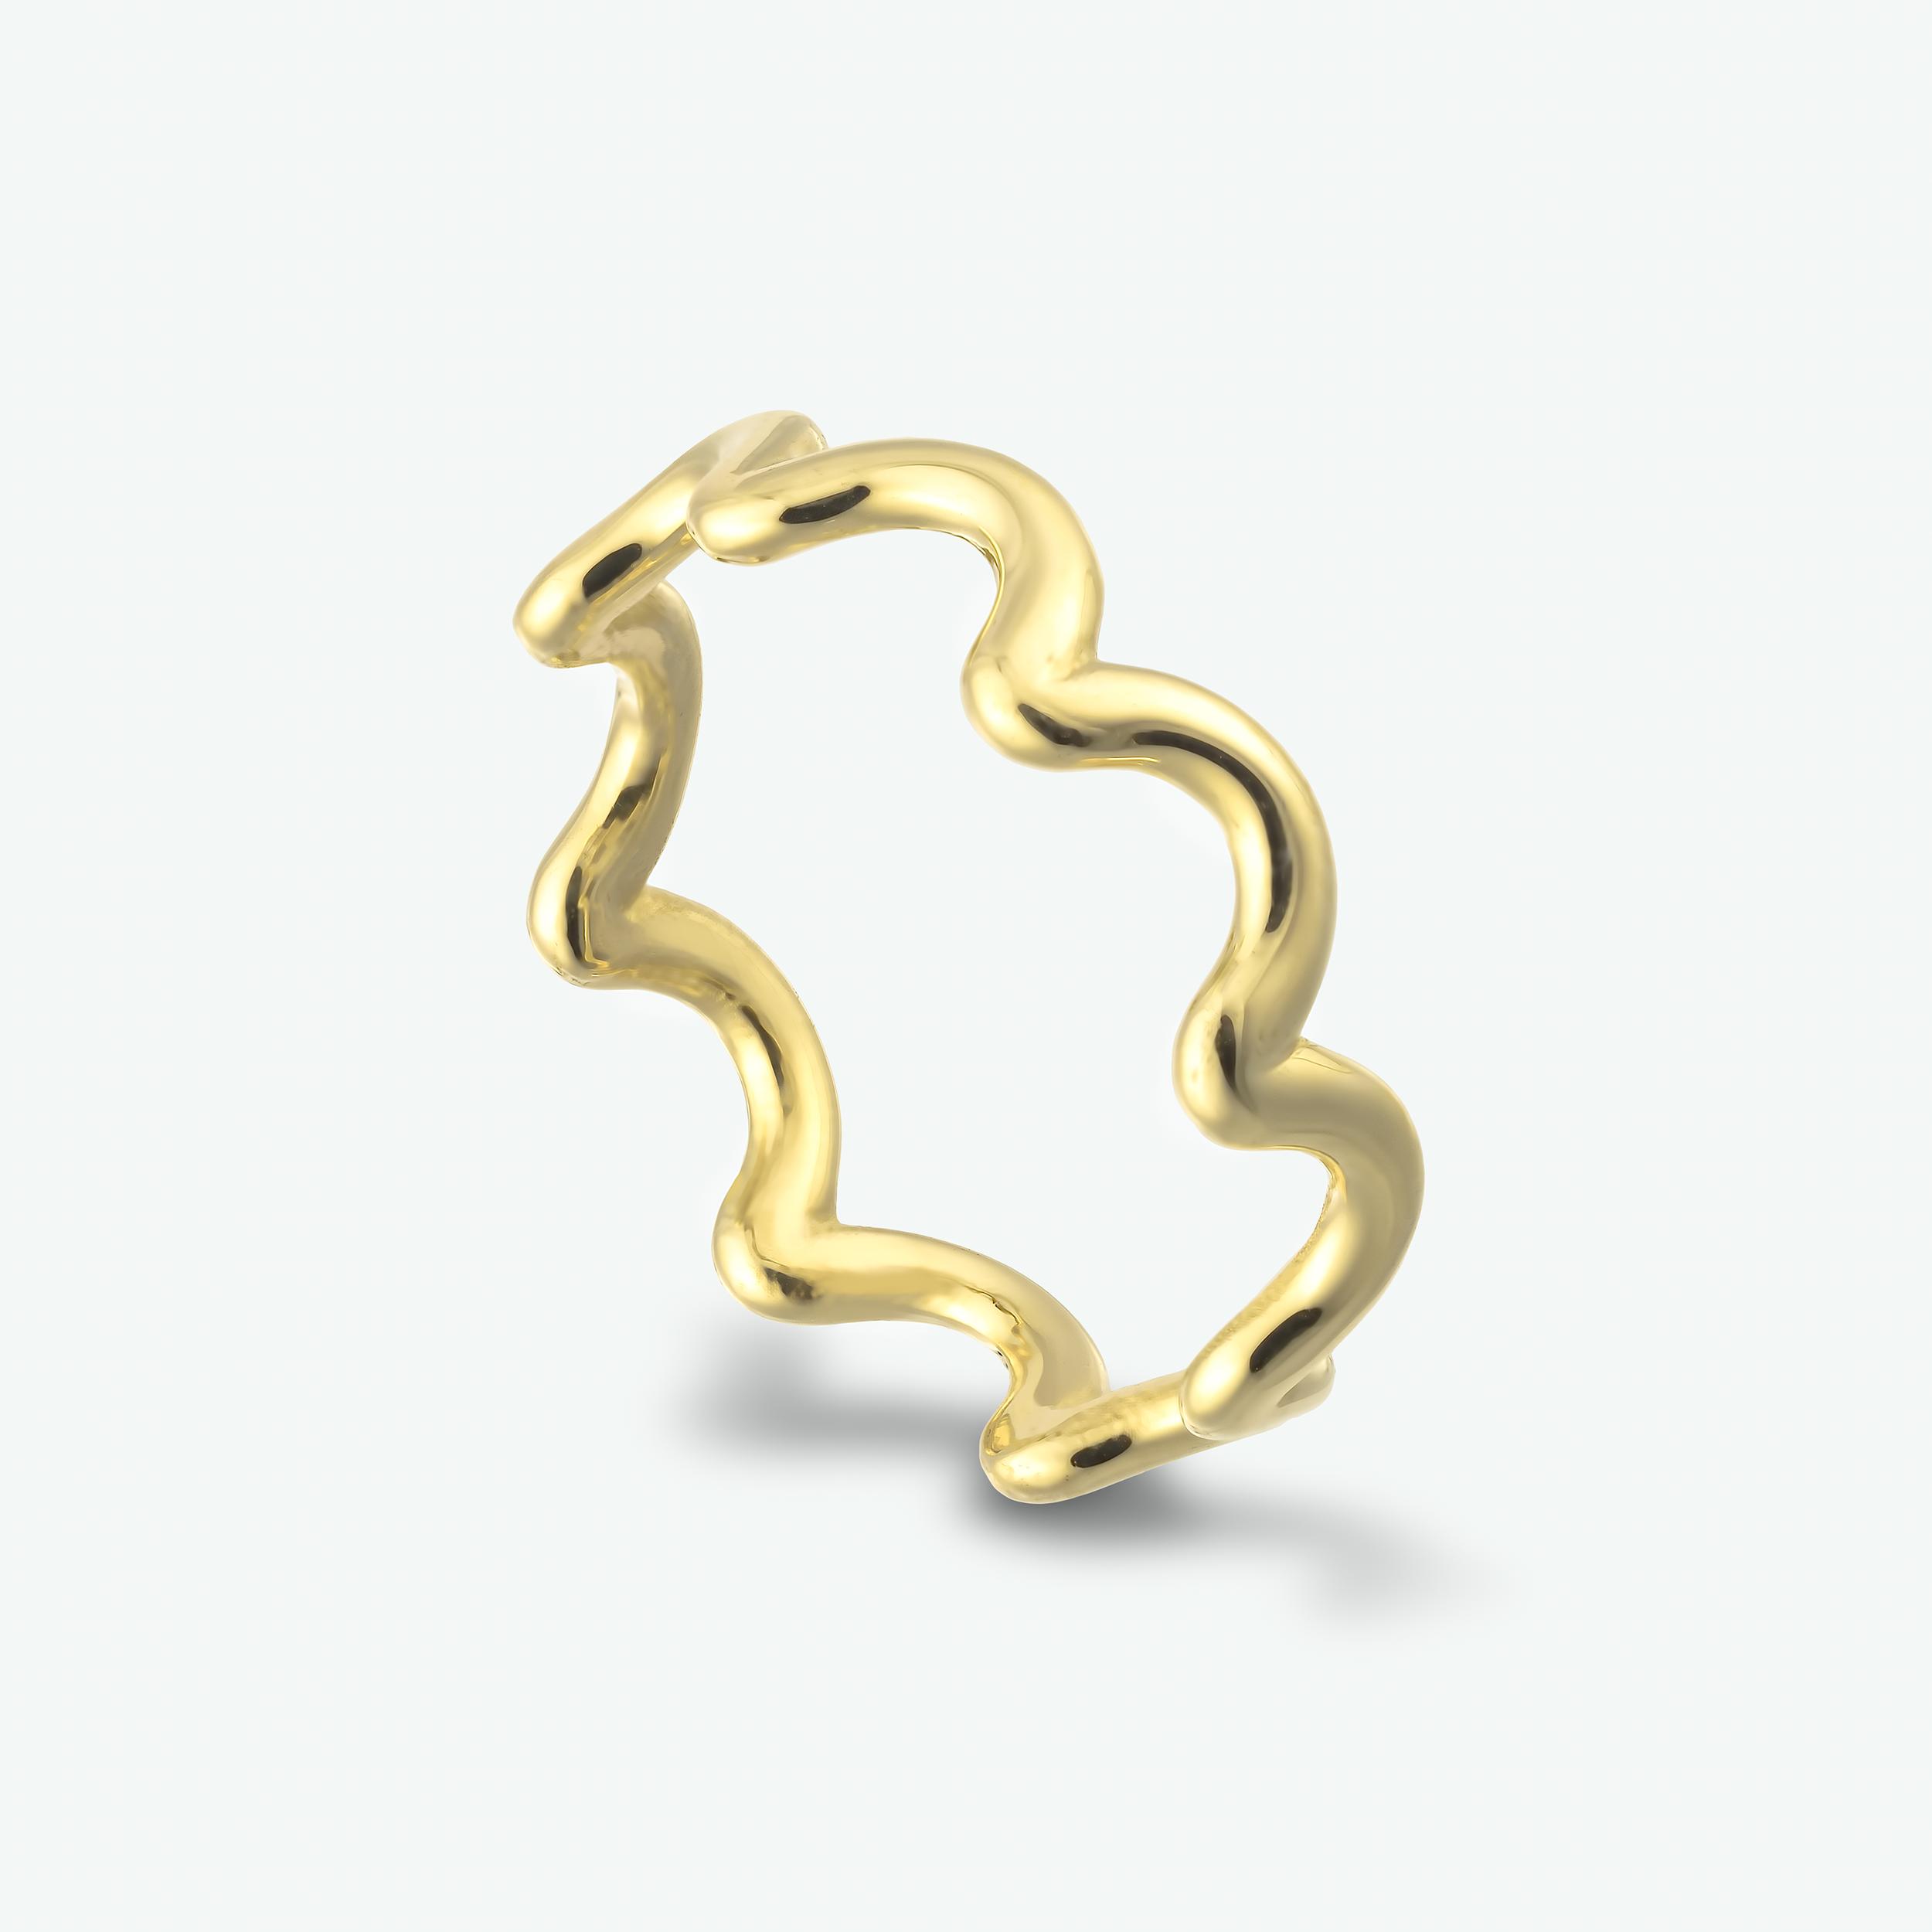 A beautifully shaped 14k yellow gold ring.